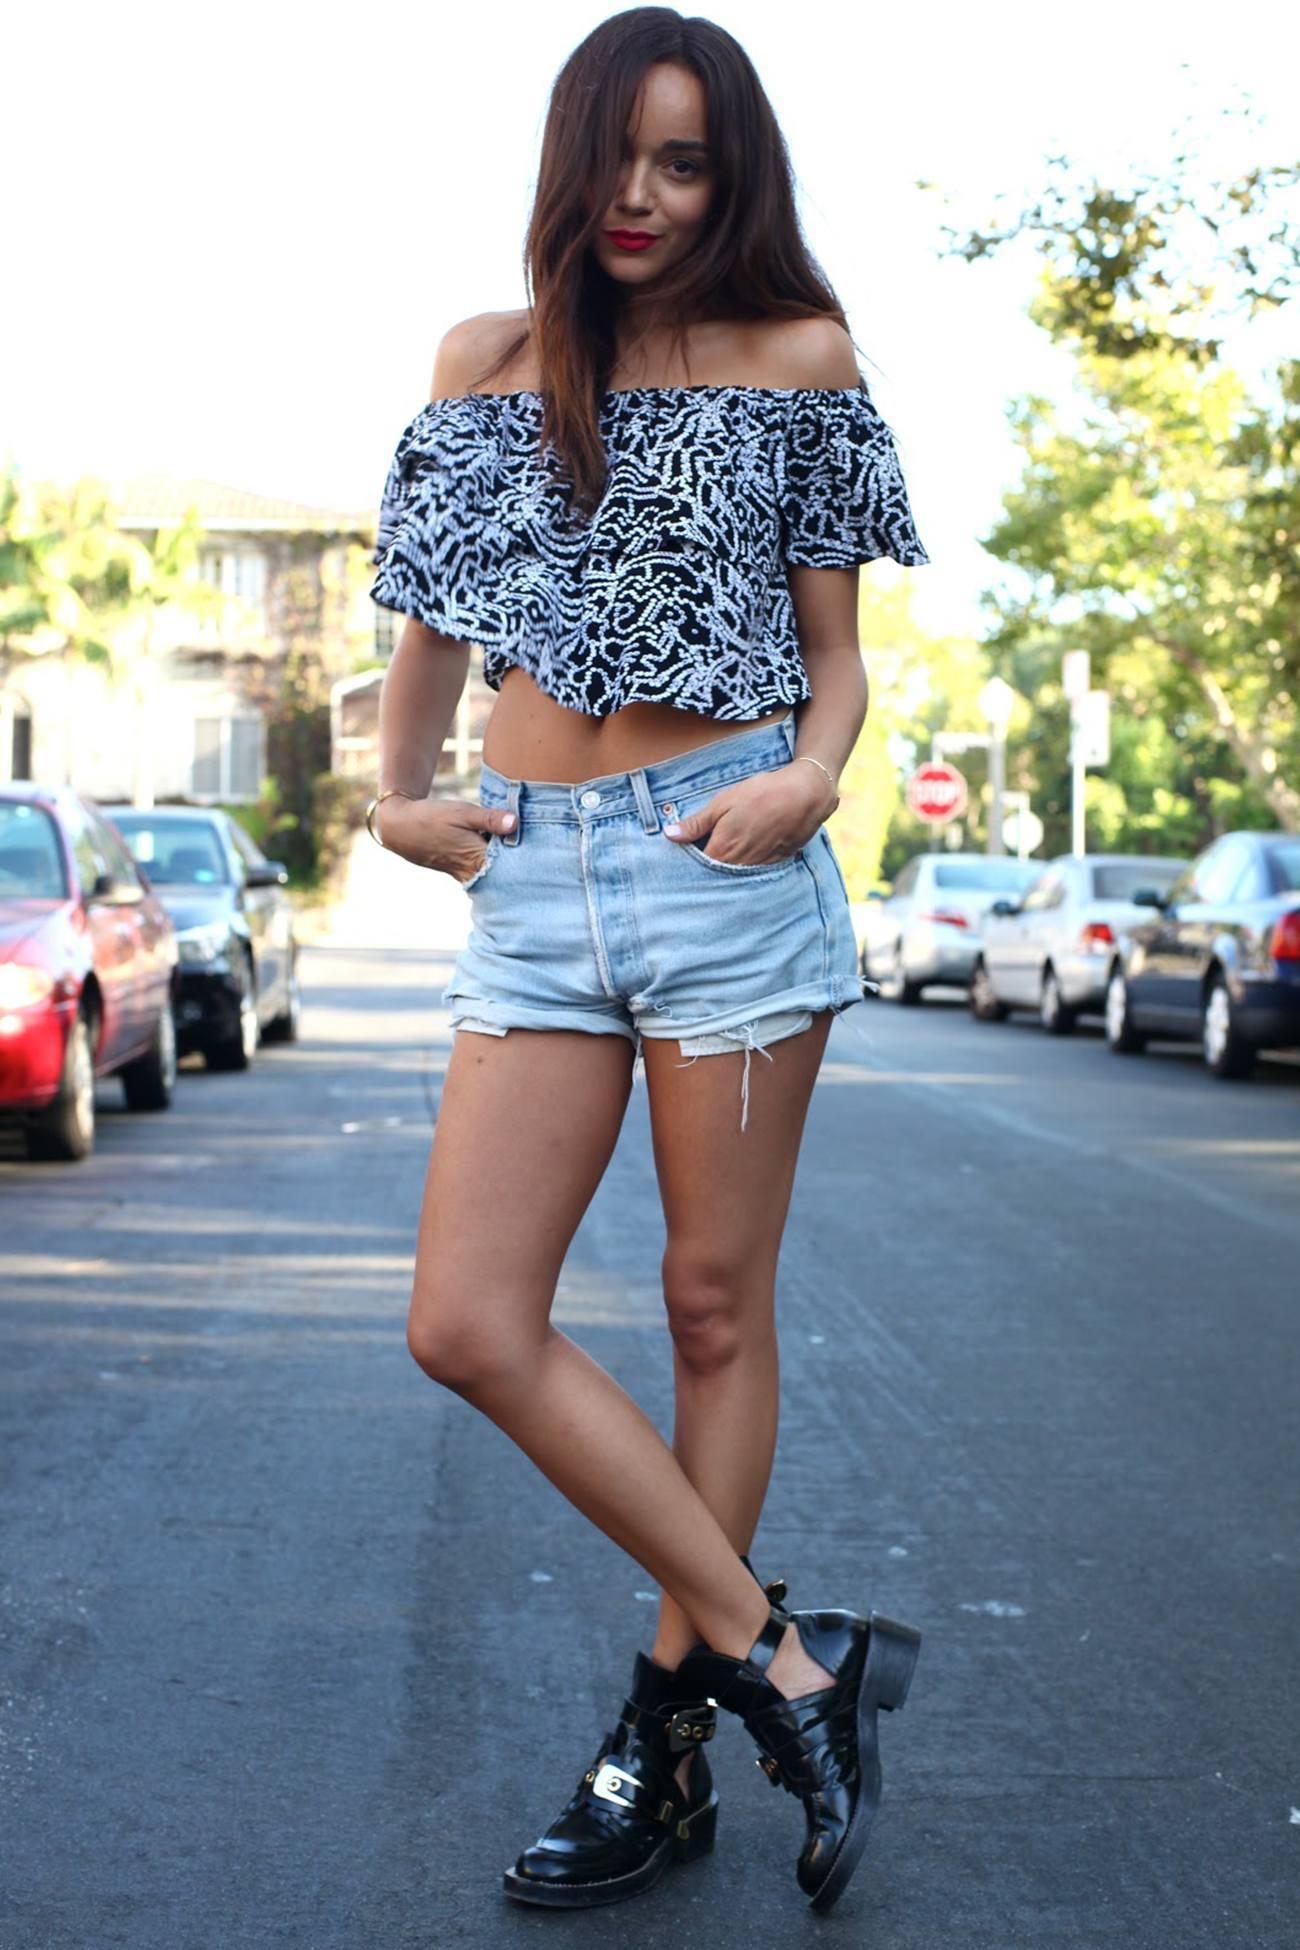 Boyfriend Shorts Outfits-16 Ways to Wear Boyfriend Shorts